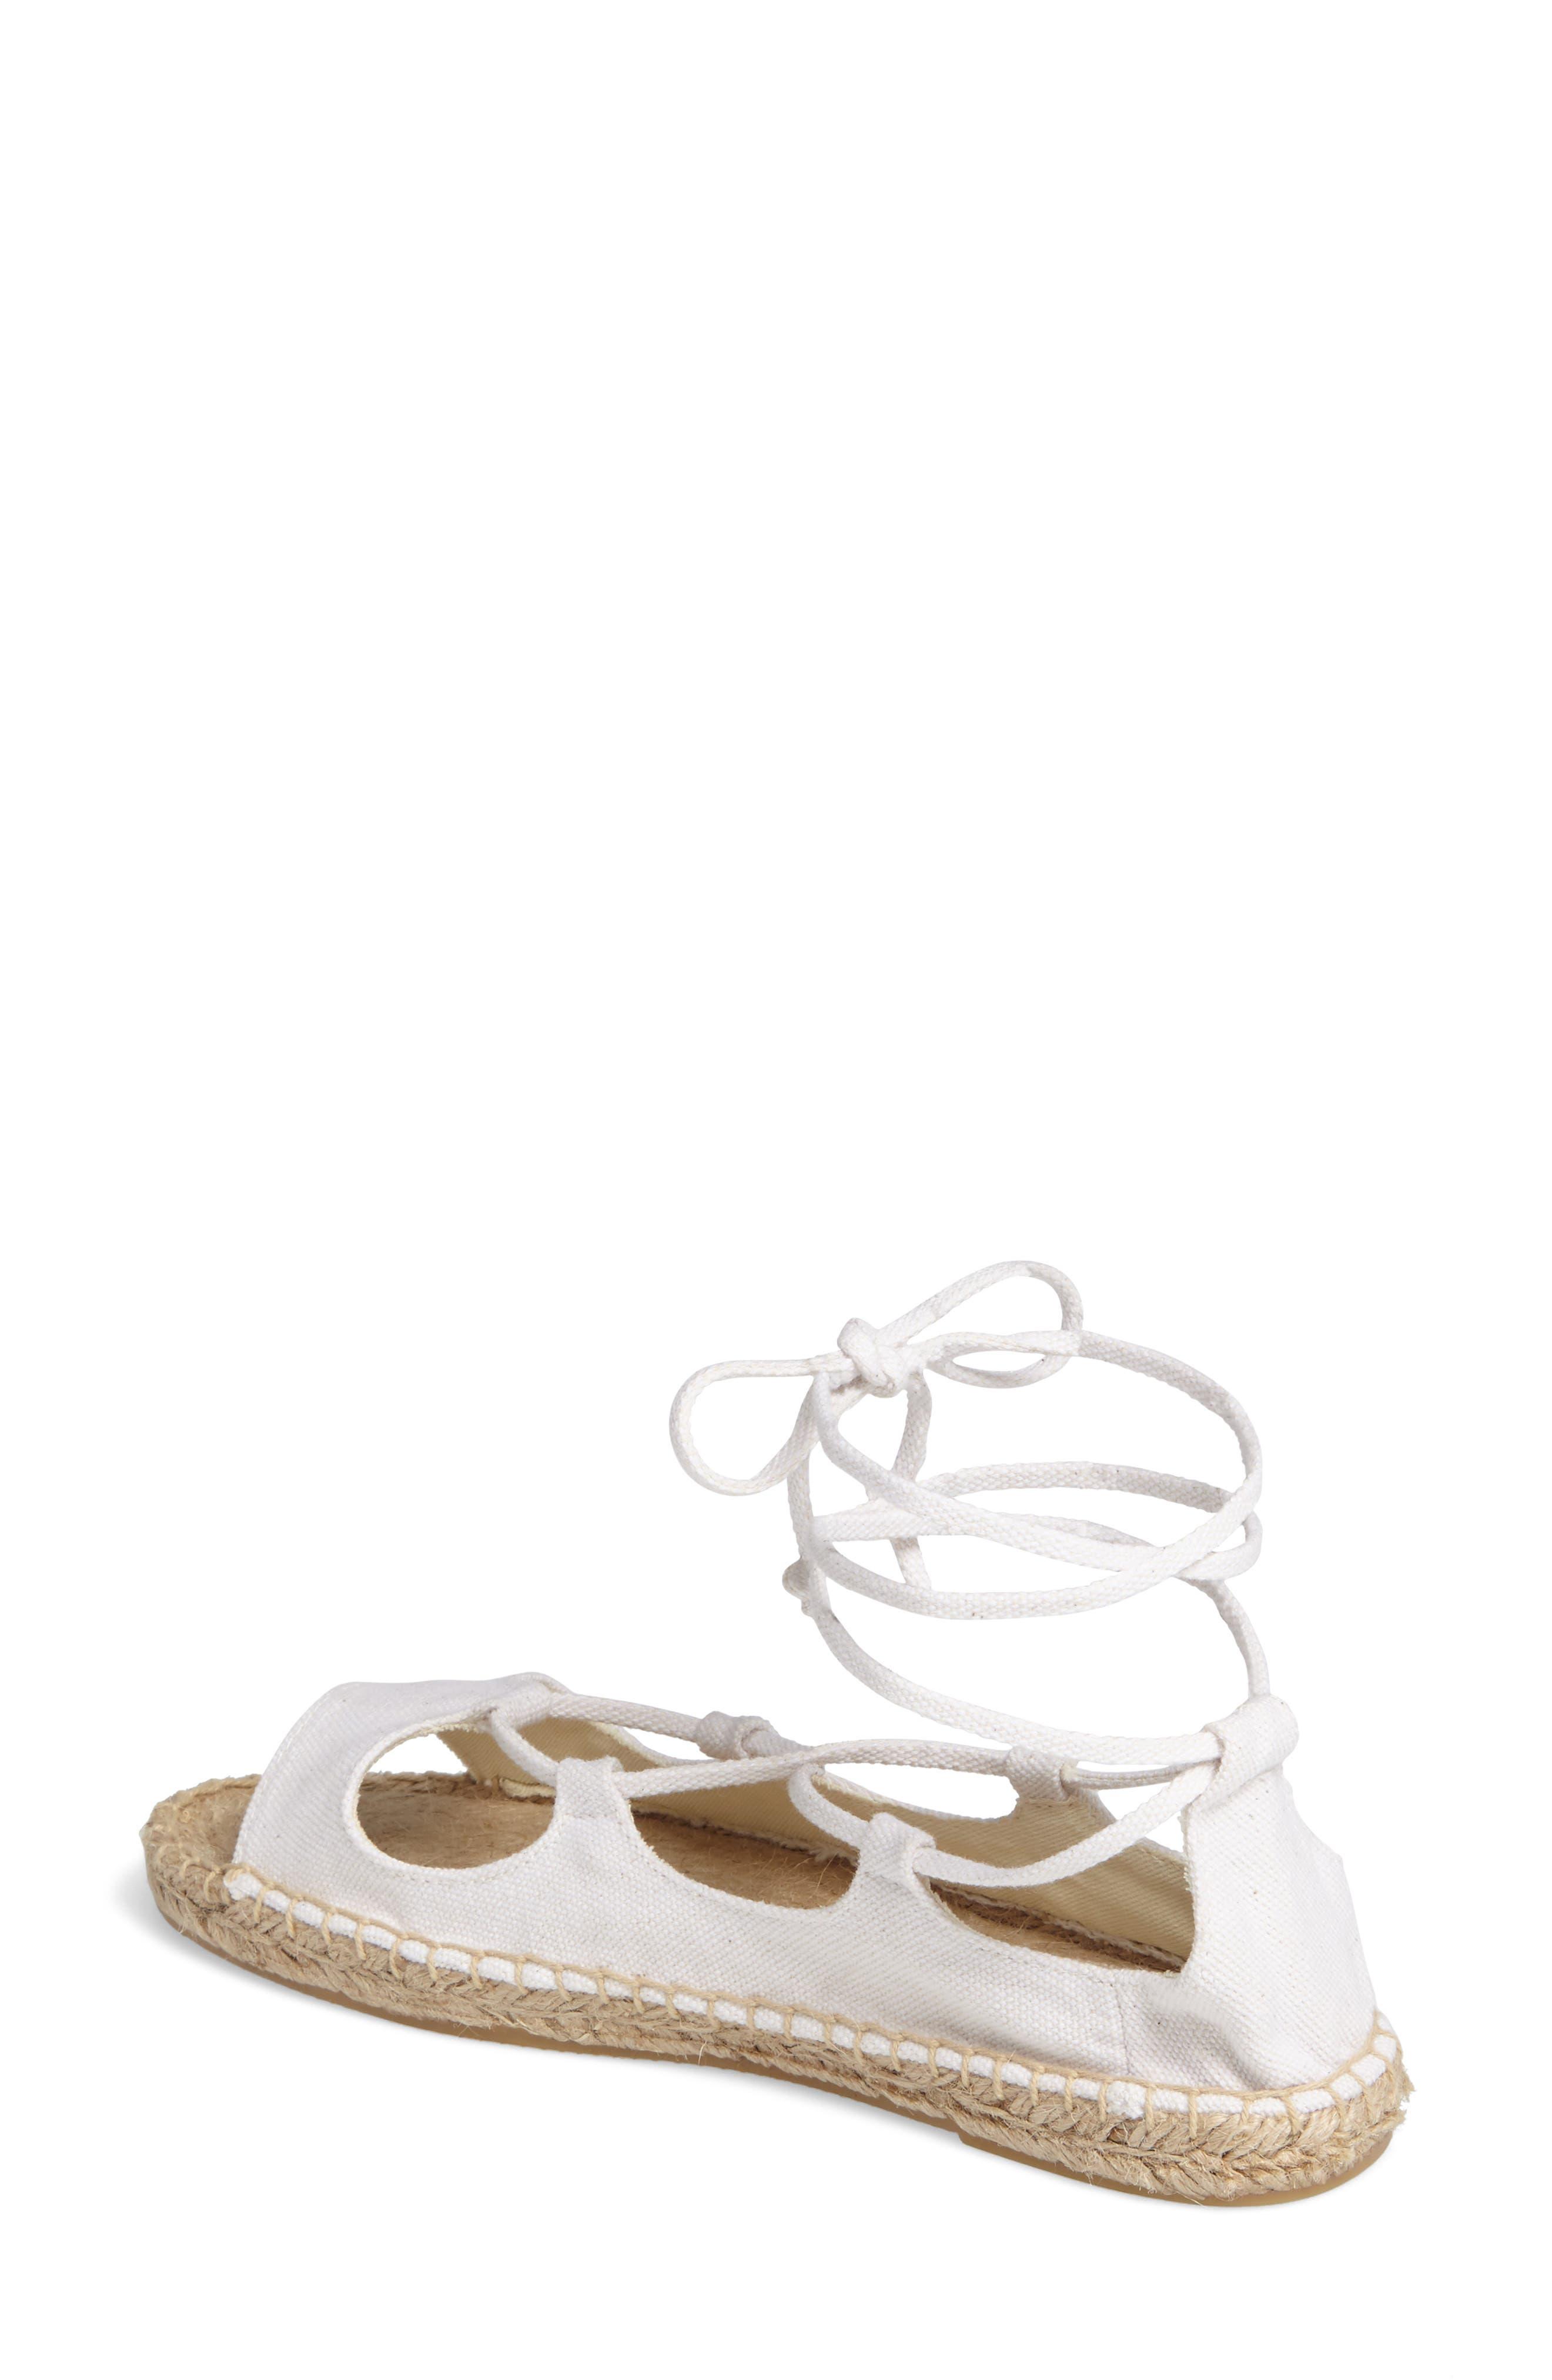 Biarritz Sandal,                             Alternate thumbnail 2, color,                             100